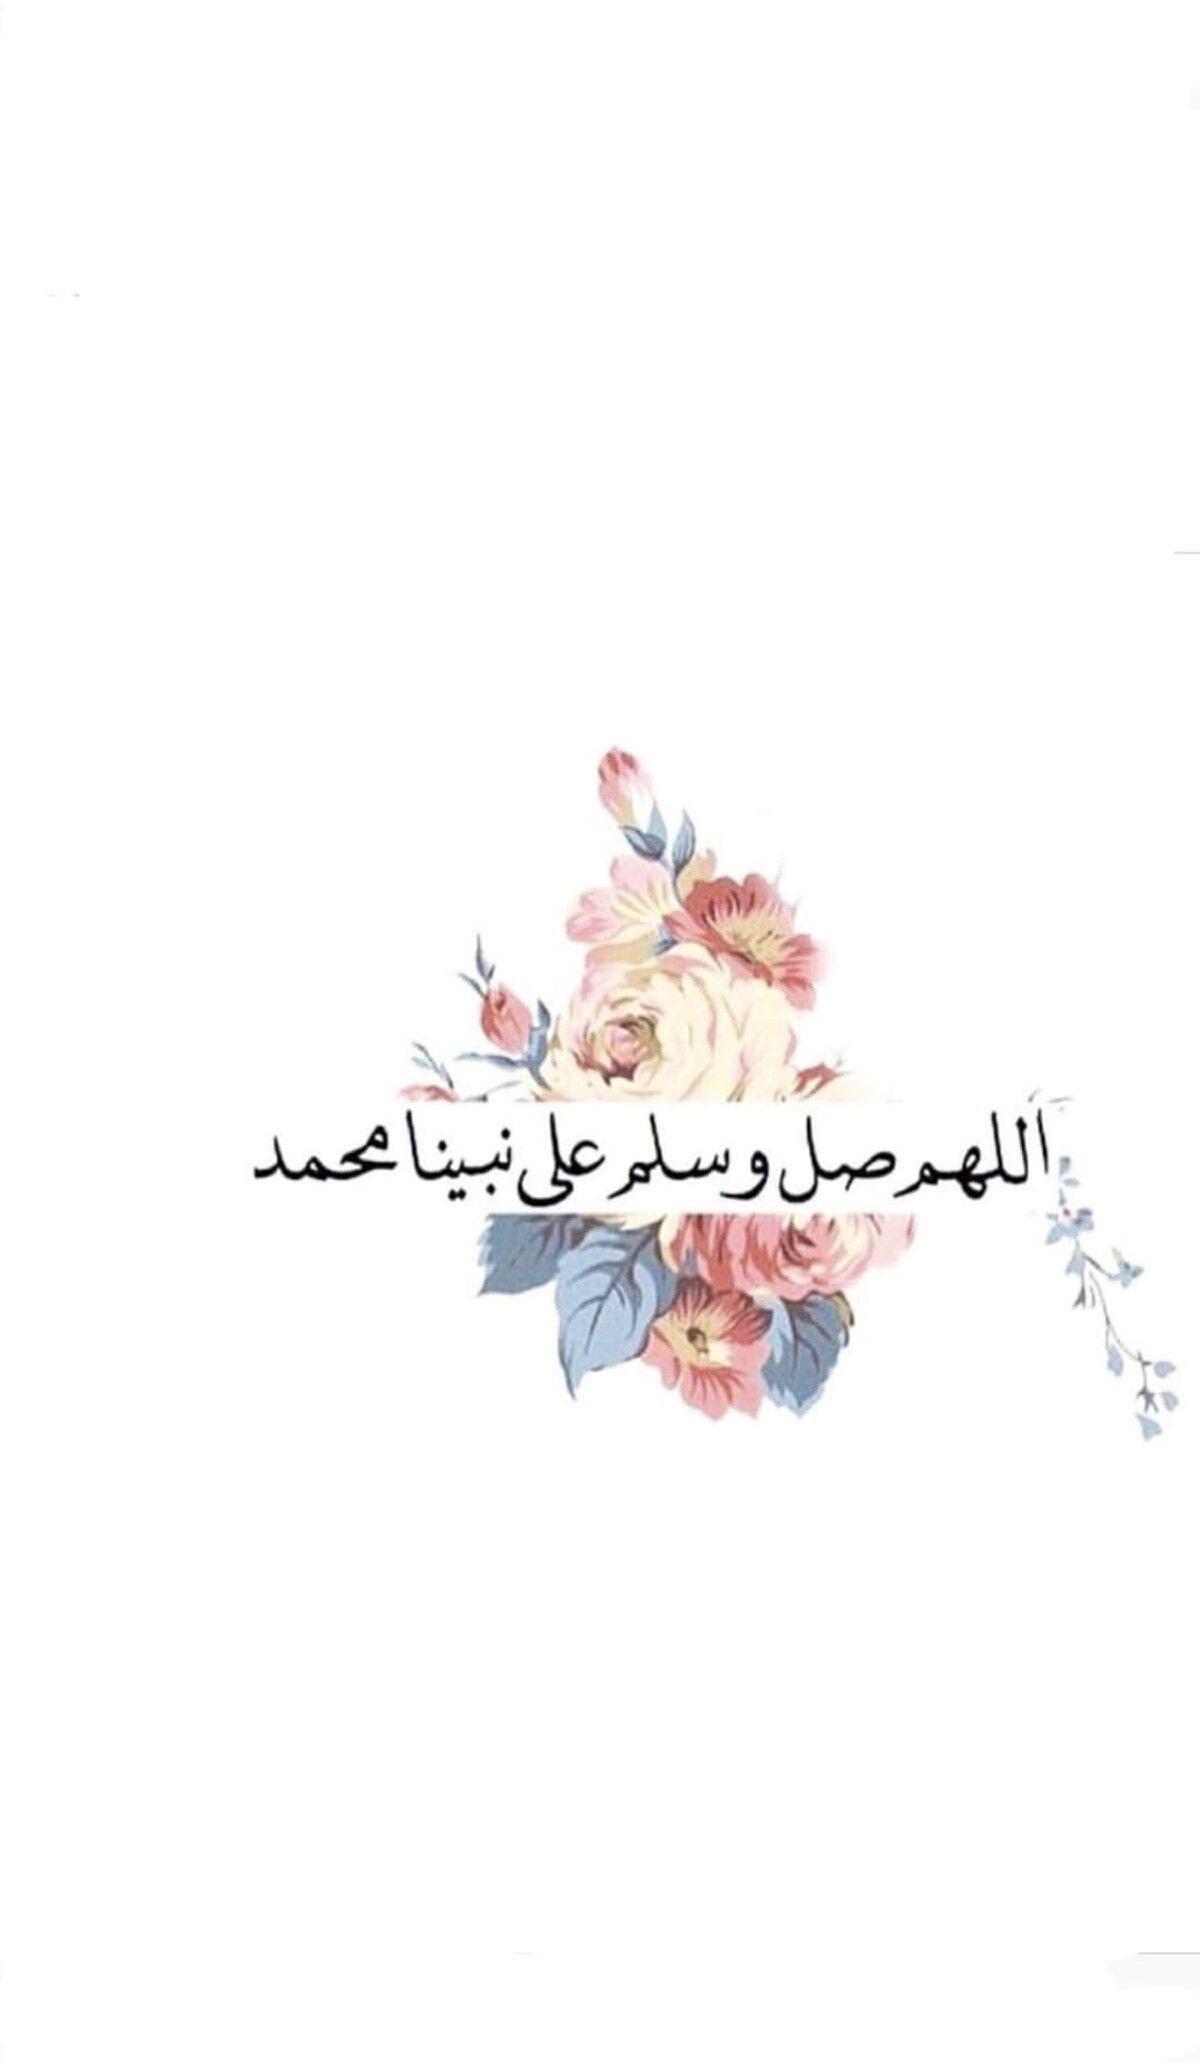 Pin By Samialgerienne On مقتطفات إسلامية Quran Wallpaper Islamic Art Beautiful Quran Quotes